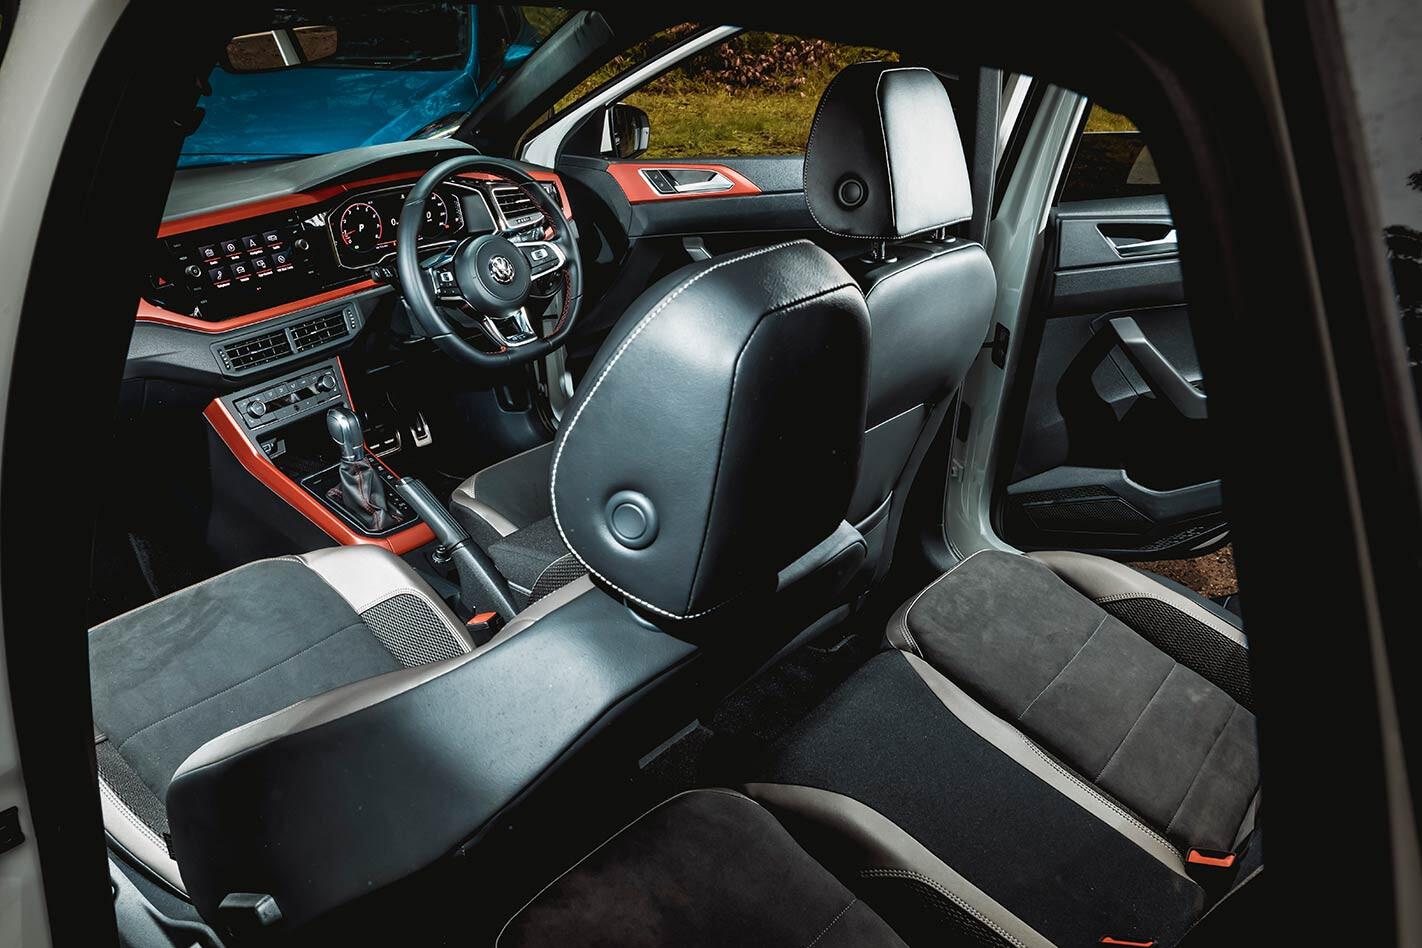 VW Polo GTI interior